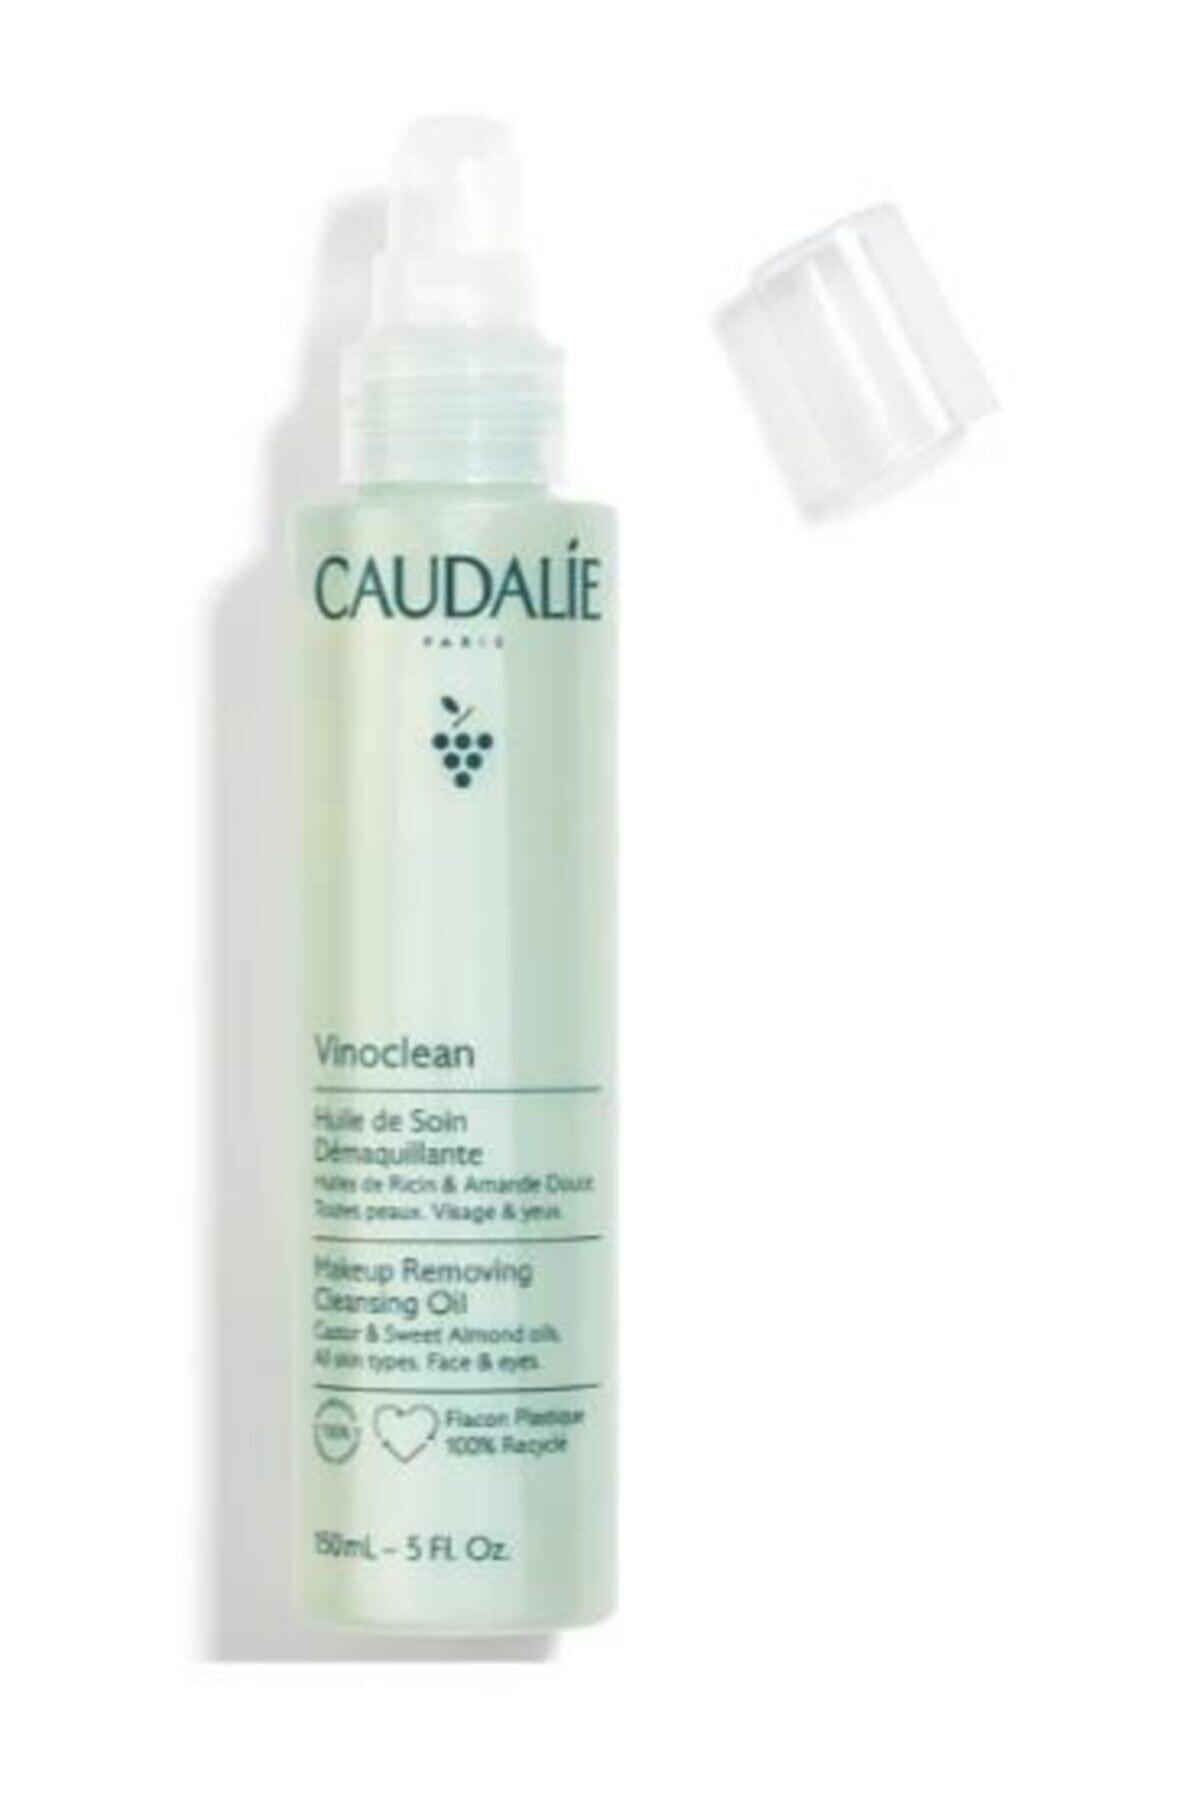 Caudalie Vinoclean Makeup Removing Cleansing Oil Makyaj Temizleme Yağı 150 ml 1